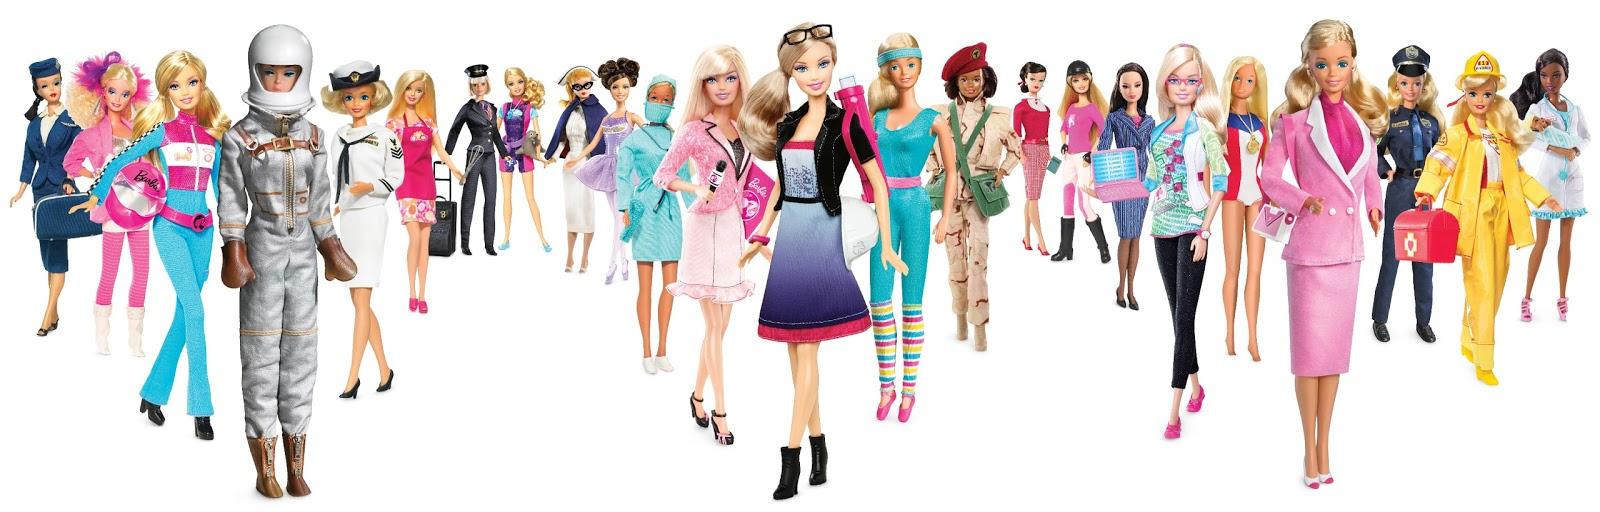 barbie careers - photo #6